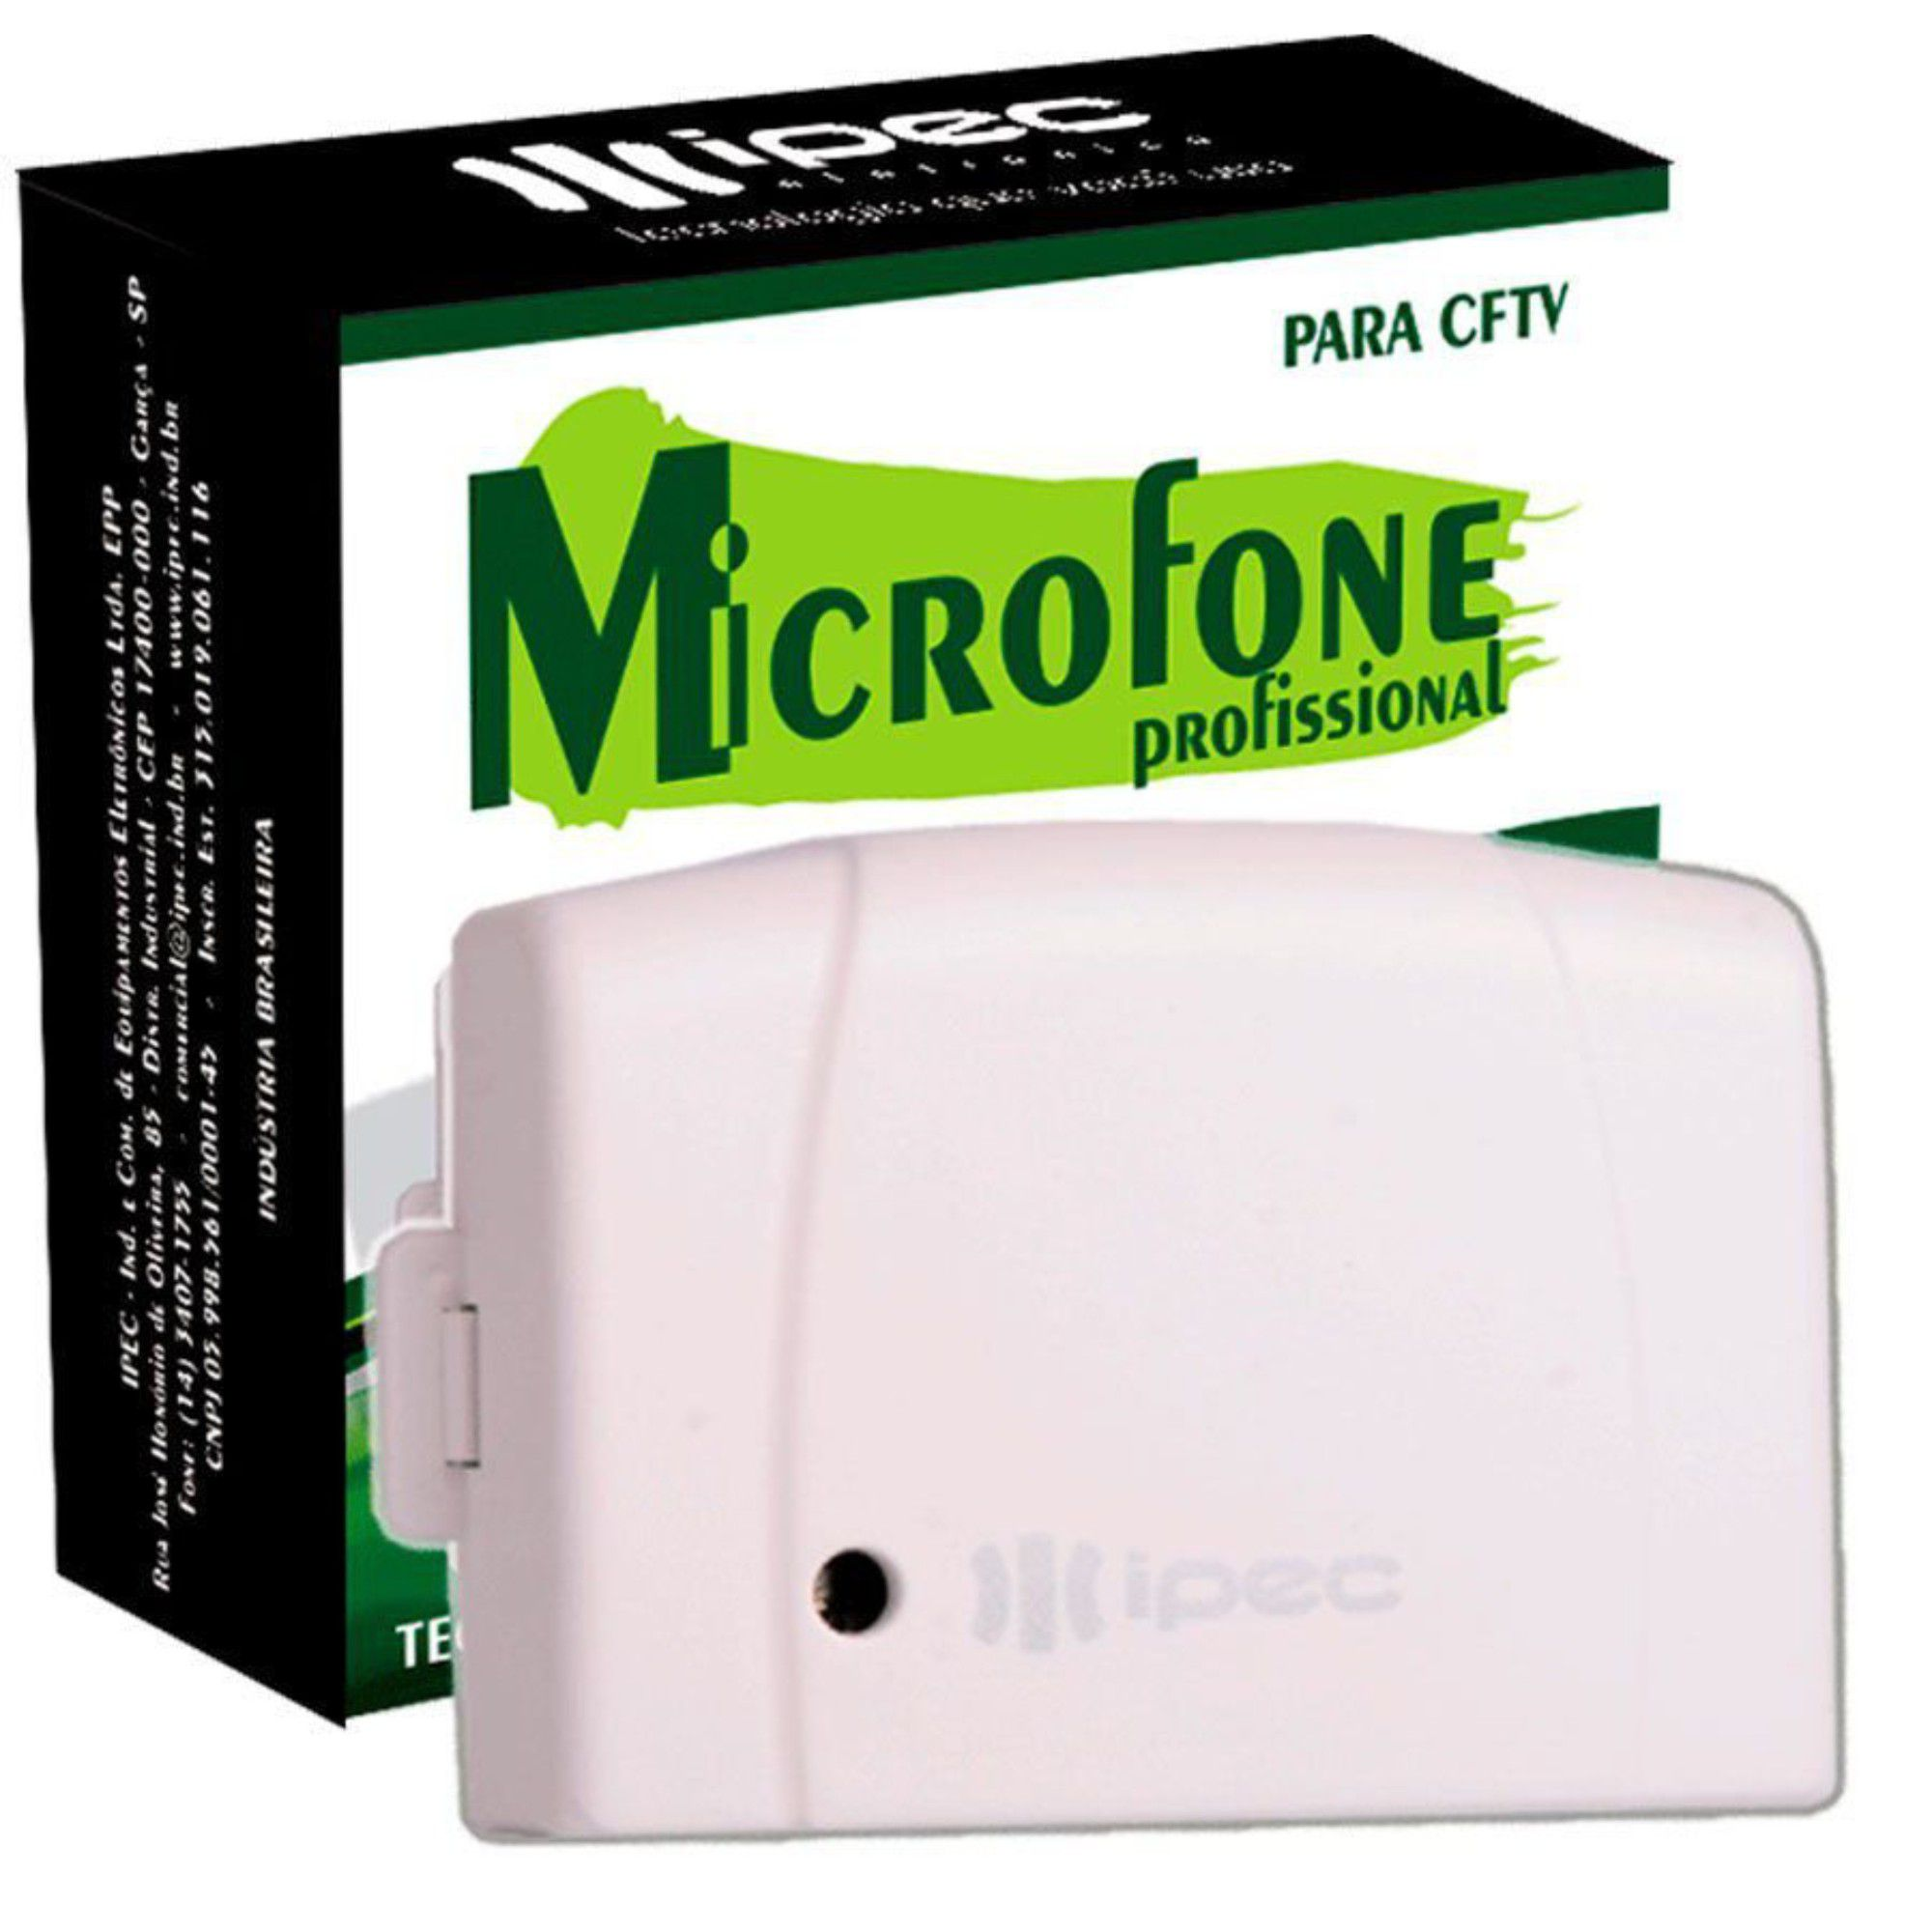 Microfone Profissional para CFTV